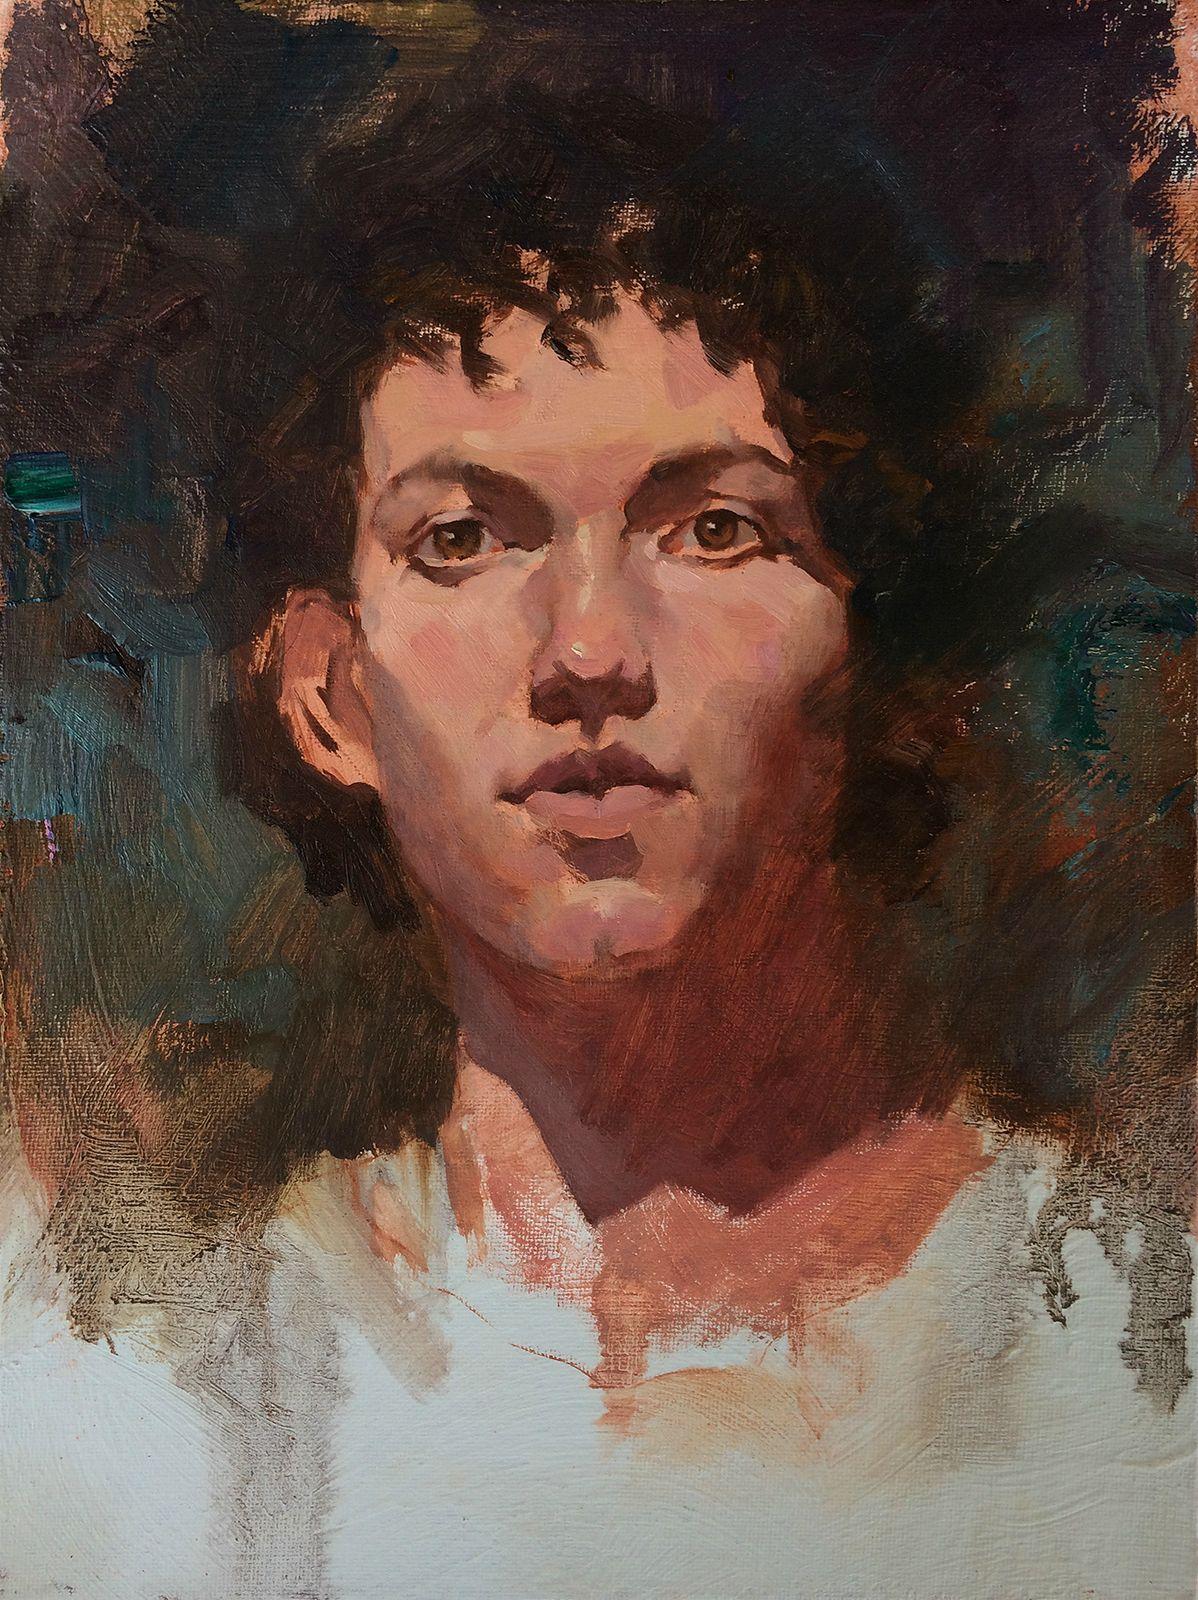 pintor_pavelsokov_24